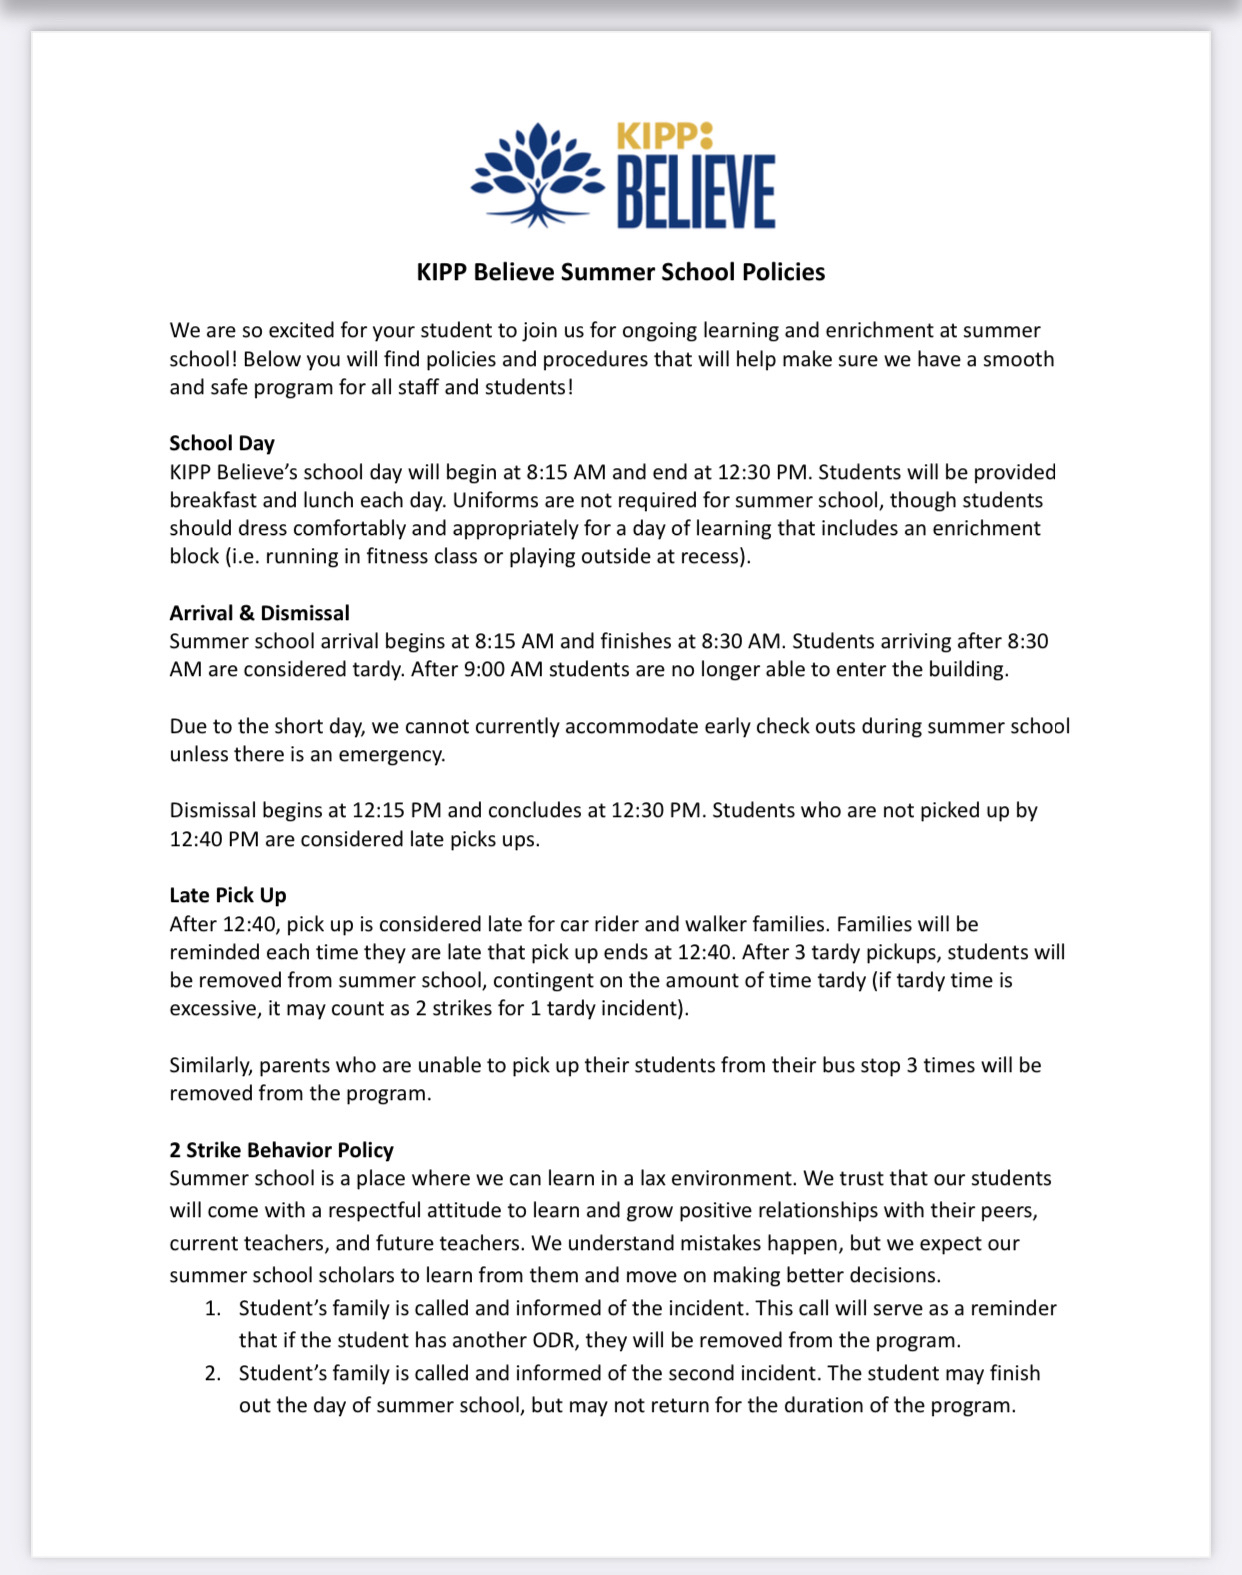 KBP Summer School Policies